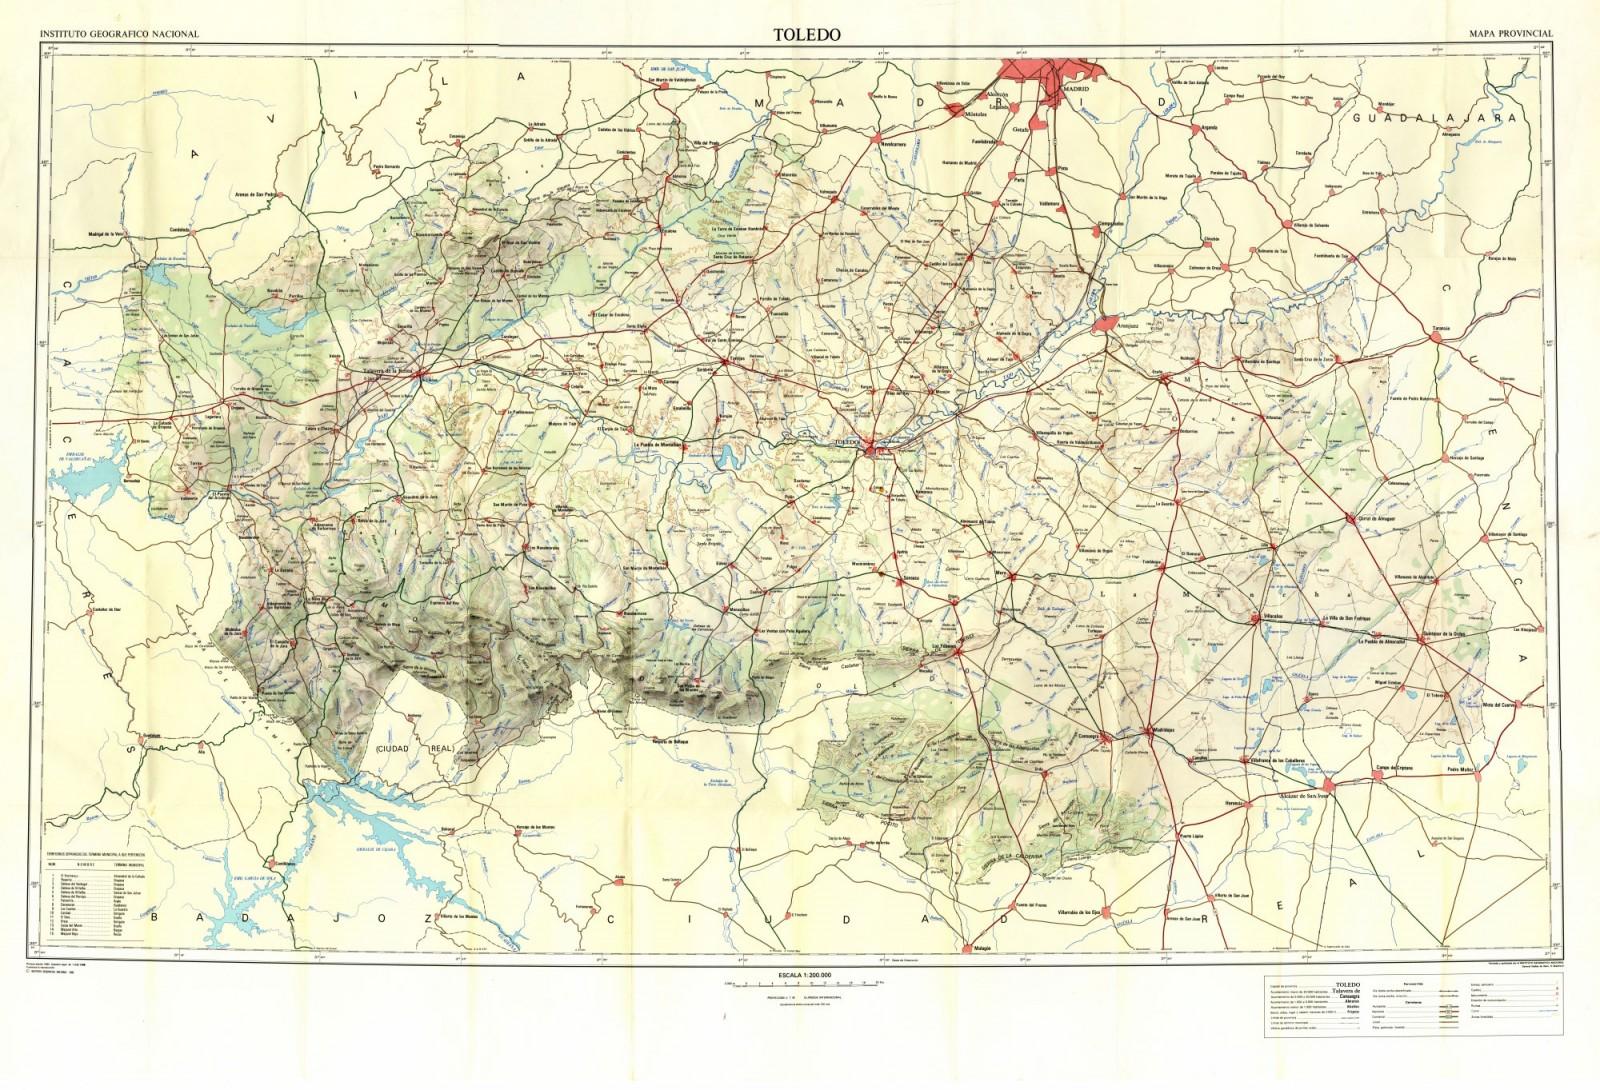 Mapa Provincia De Toledo Turismo.Mapas De La Provincia Ayuntamiento De Toledo